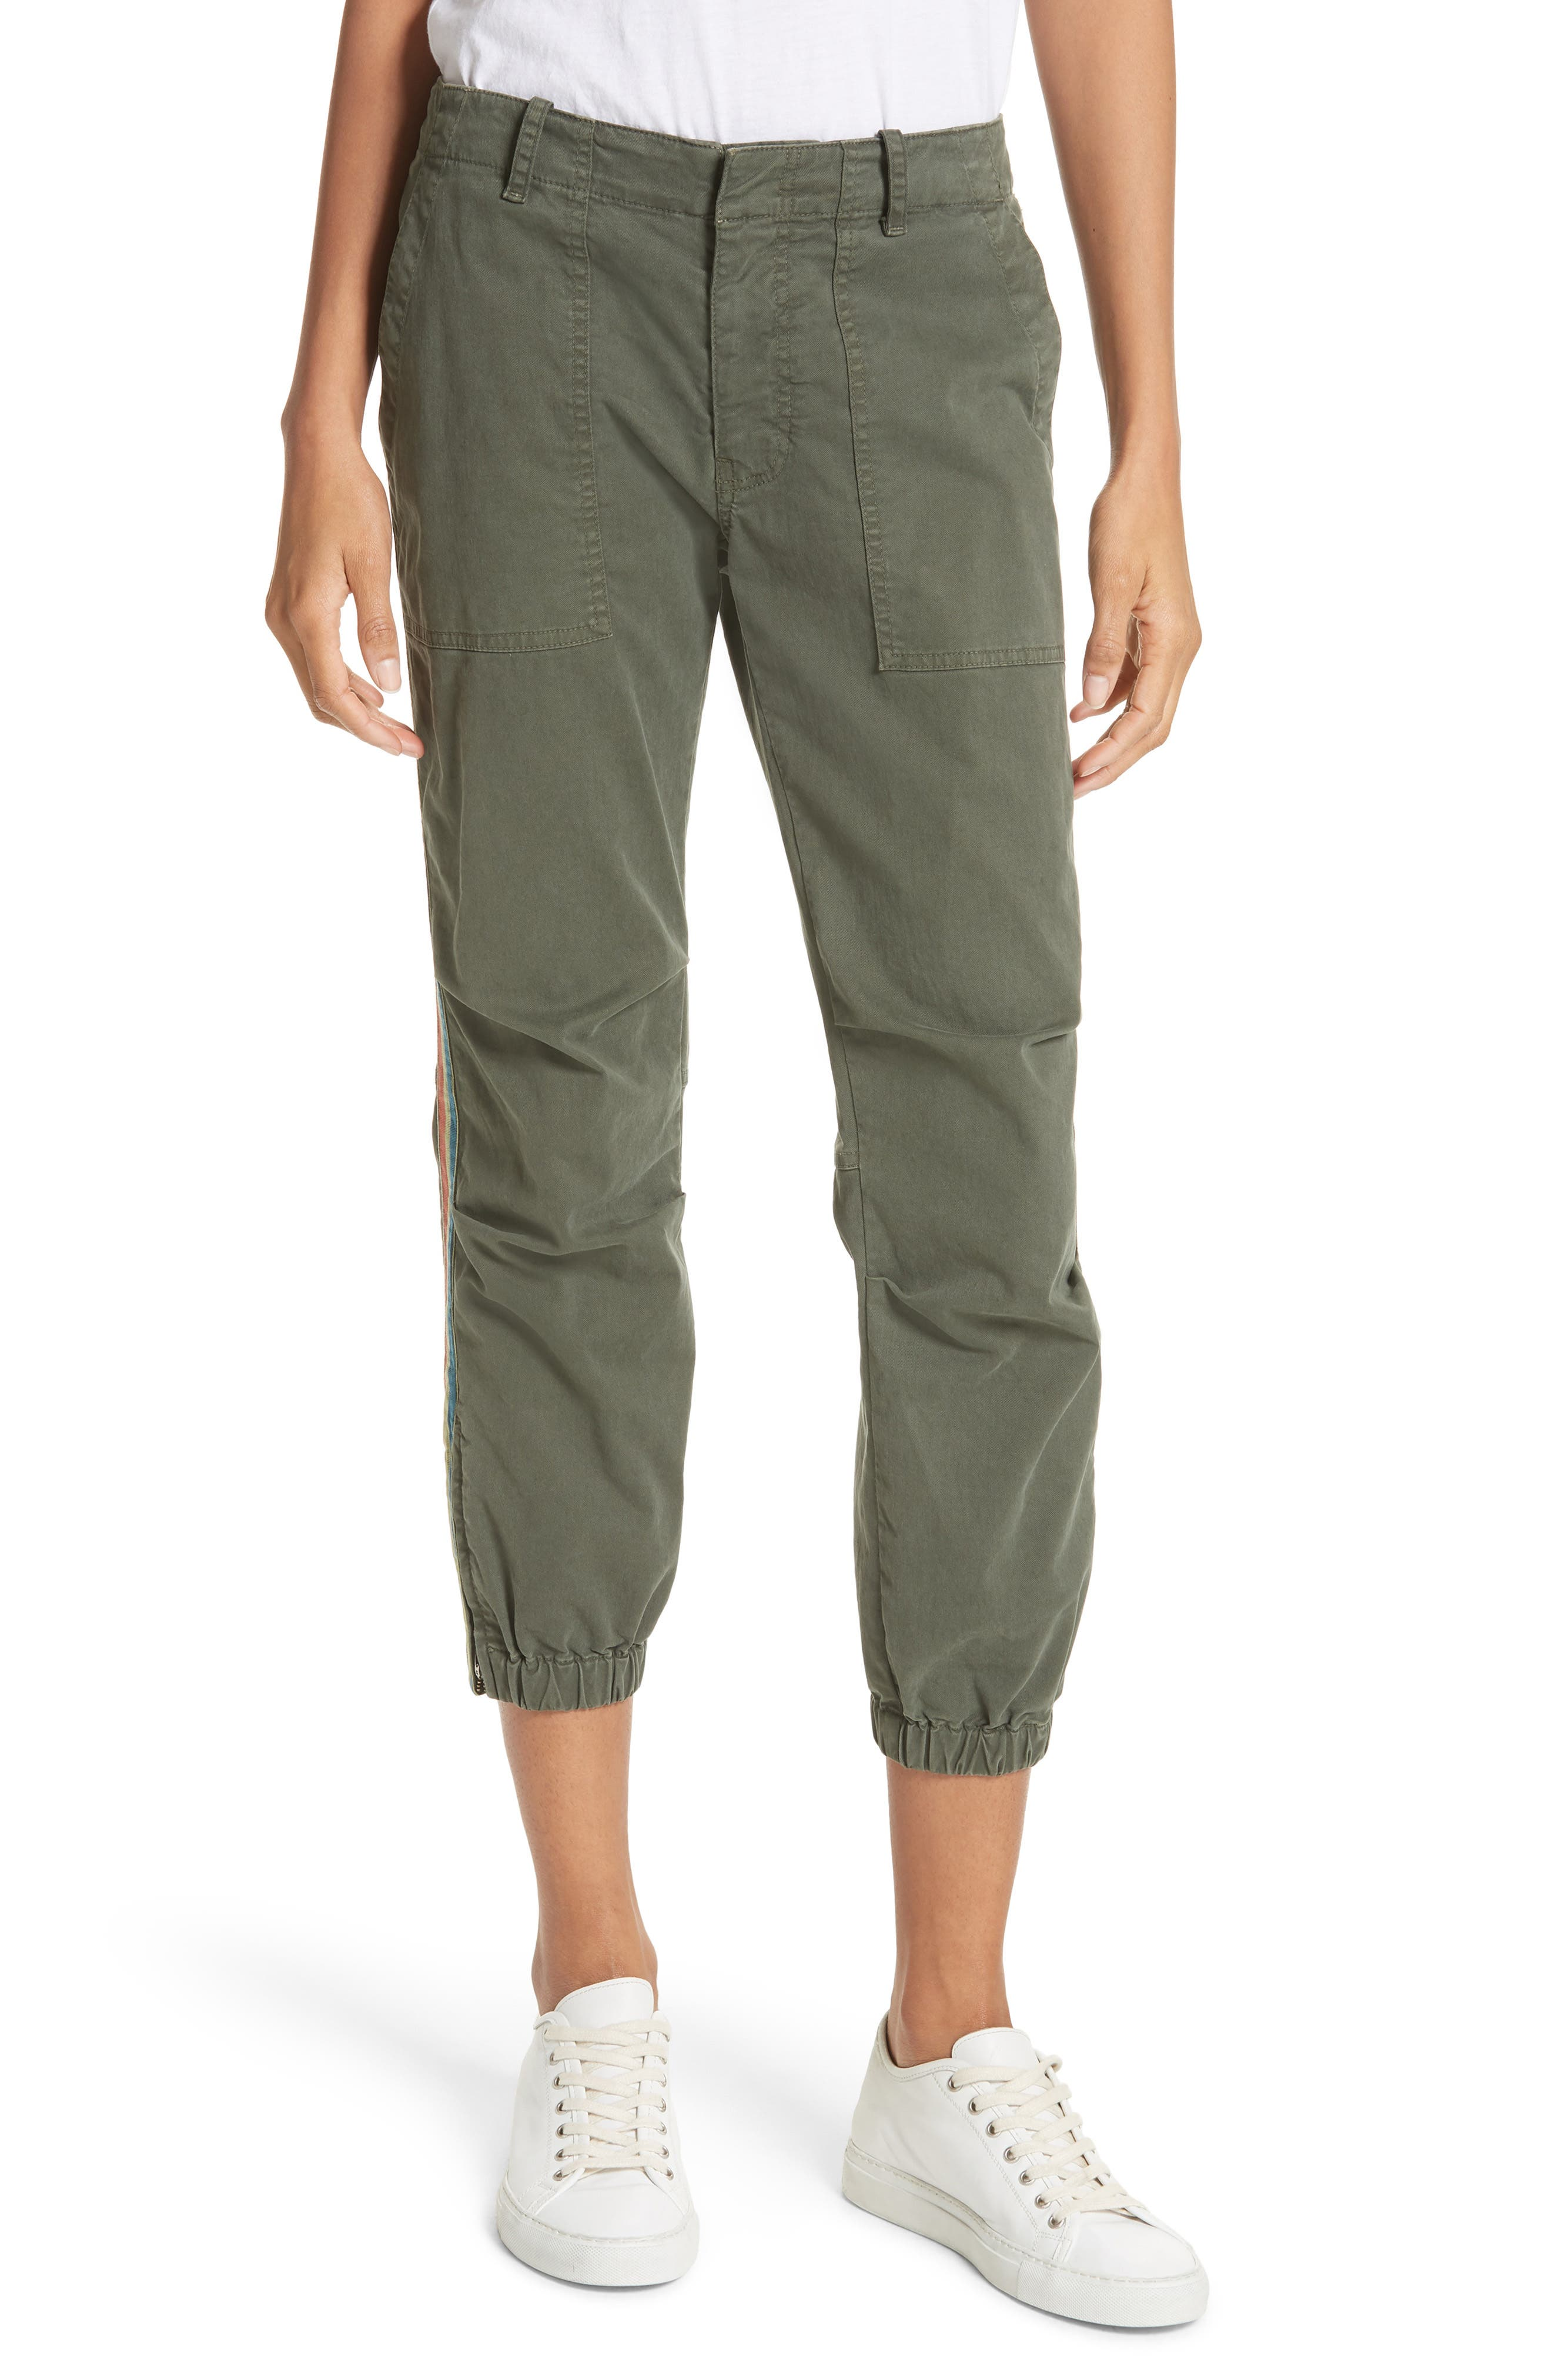 French Crop Military Pants,                             Main thumbnail 1, color,                             Loden